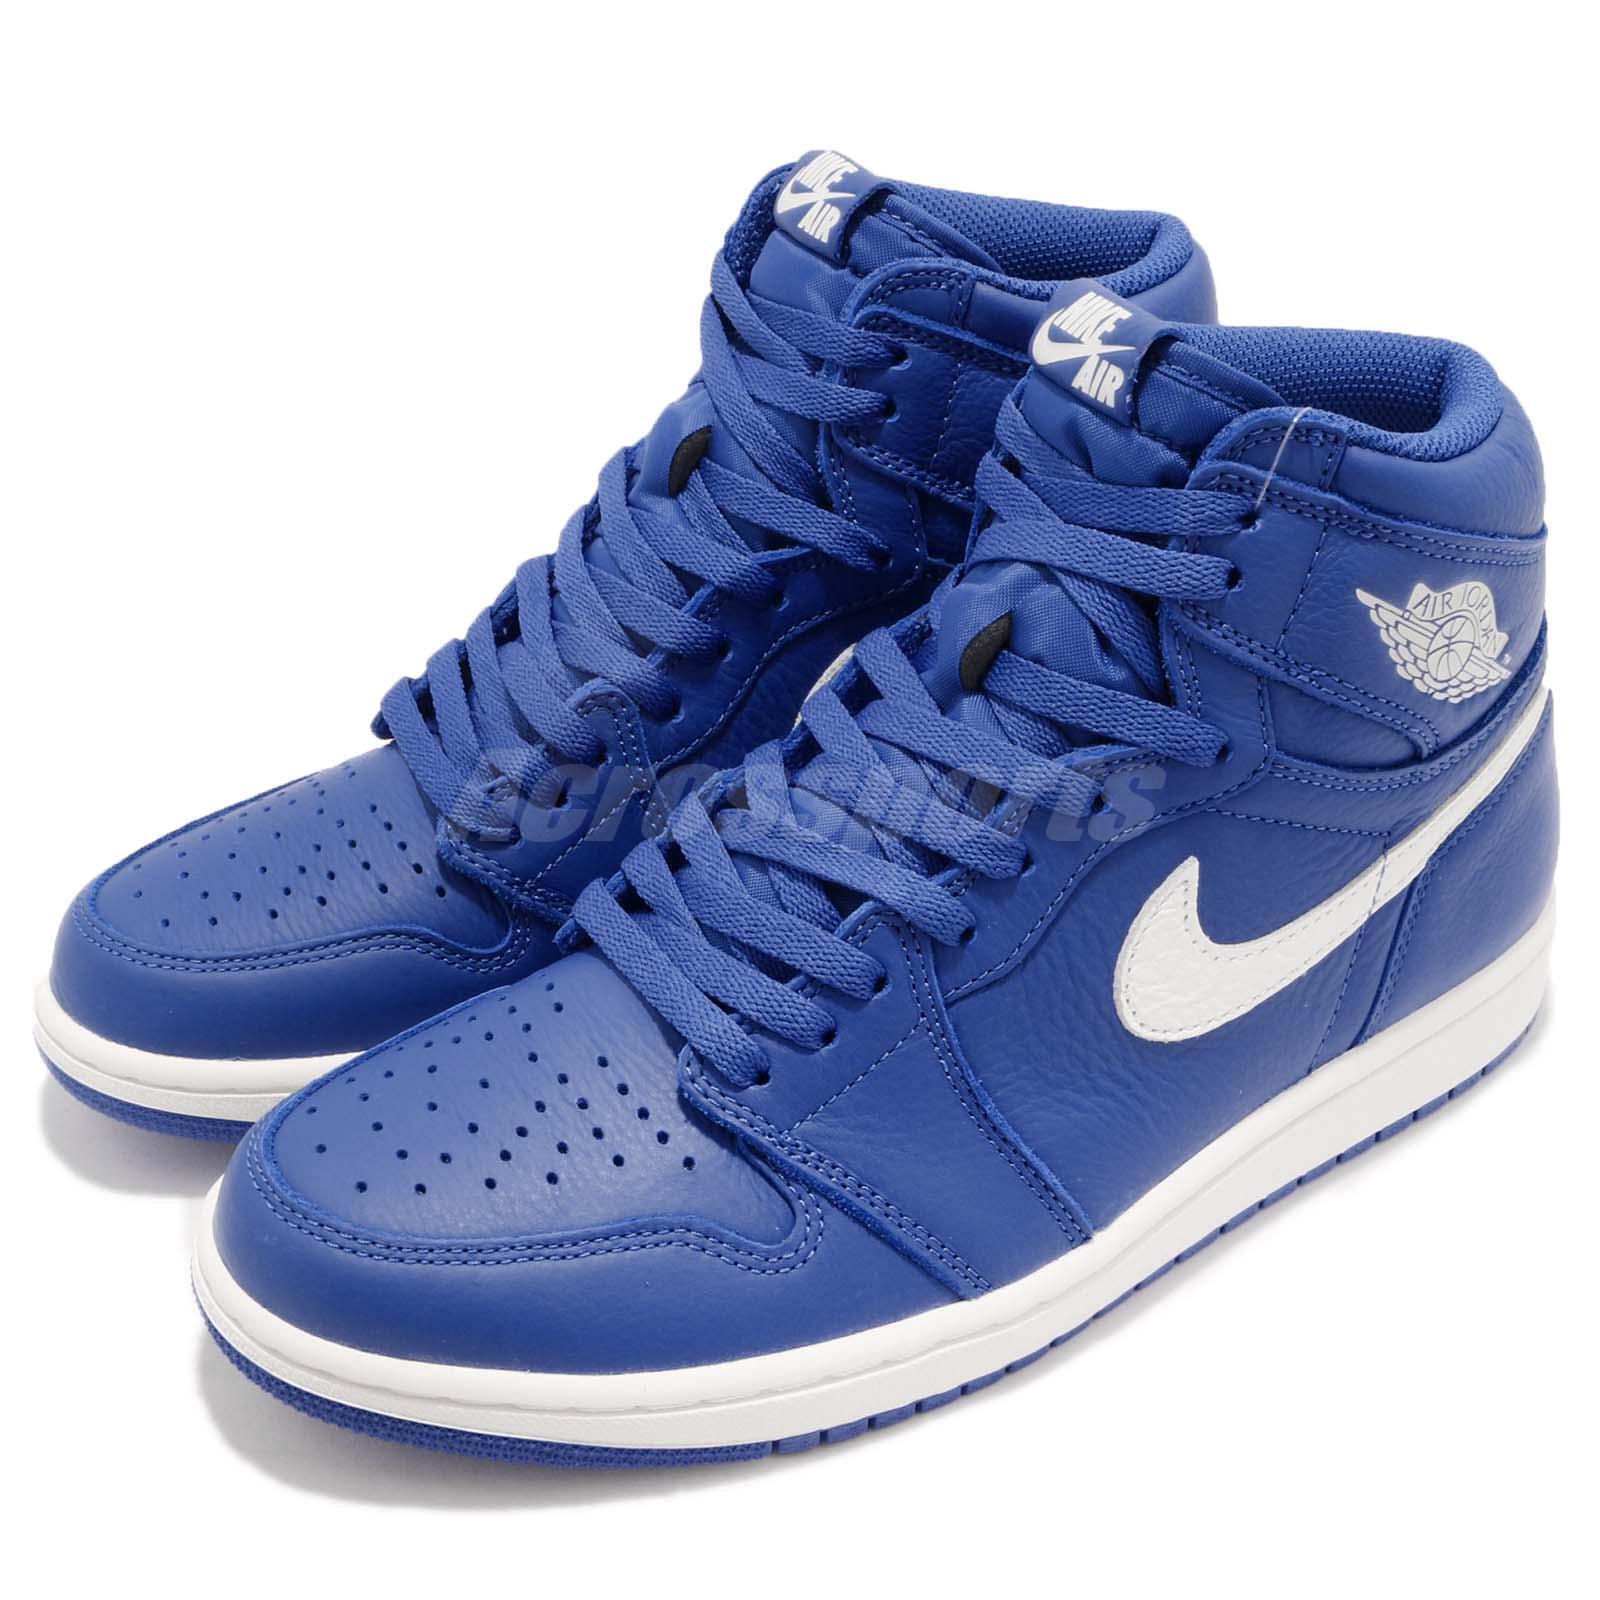 promo code 1c171 8601f Nike Air Air Air Jordan 1 Retro High OG I AJ1 Hyper Royal Sail Men Shoes